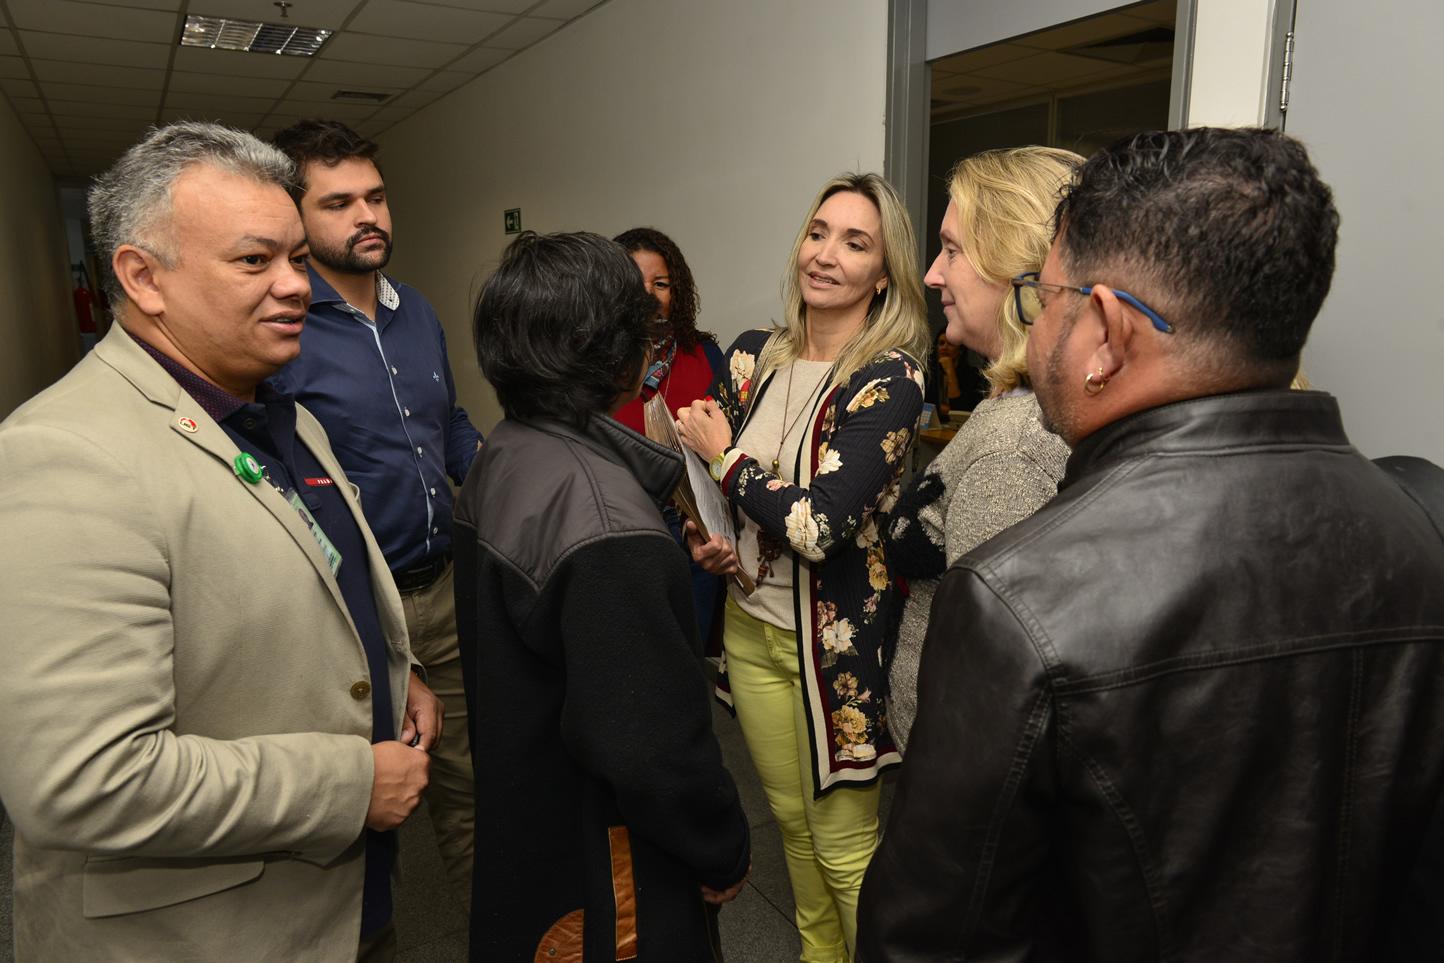 2019.06.13_Visita-aos-gabinetes-contra-o-fim-da-licenca-premio_fotos-Deva-Garcia-4